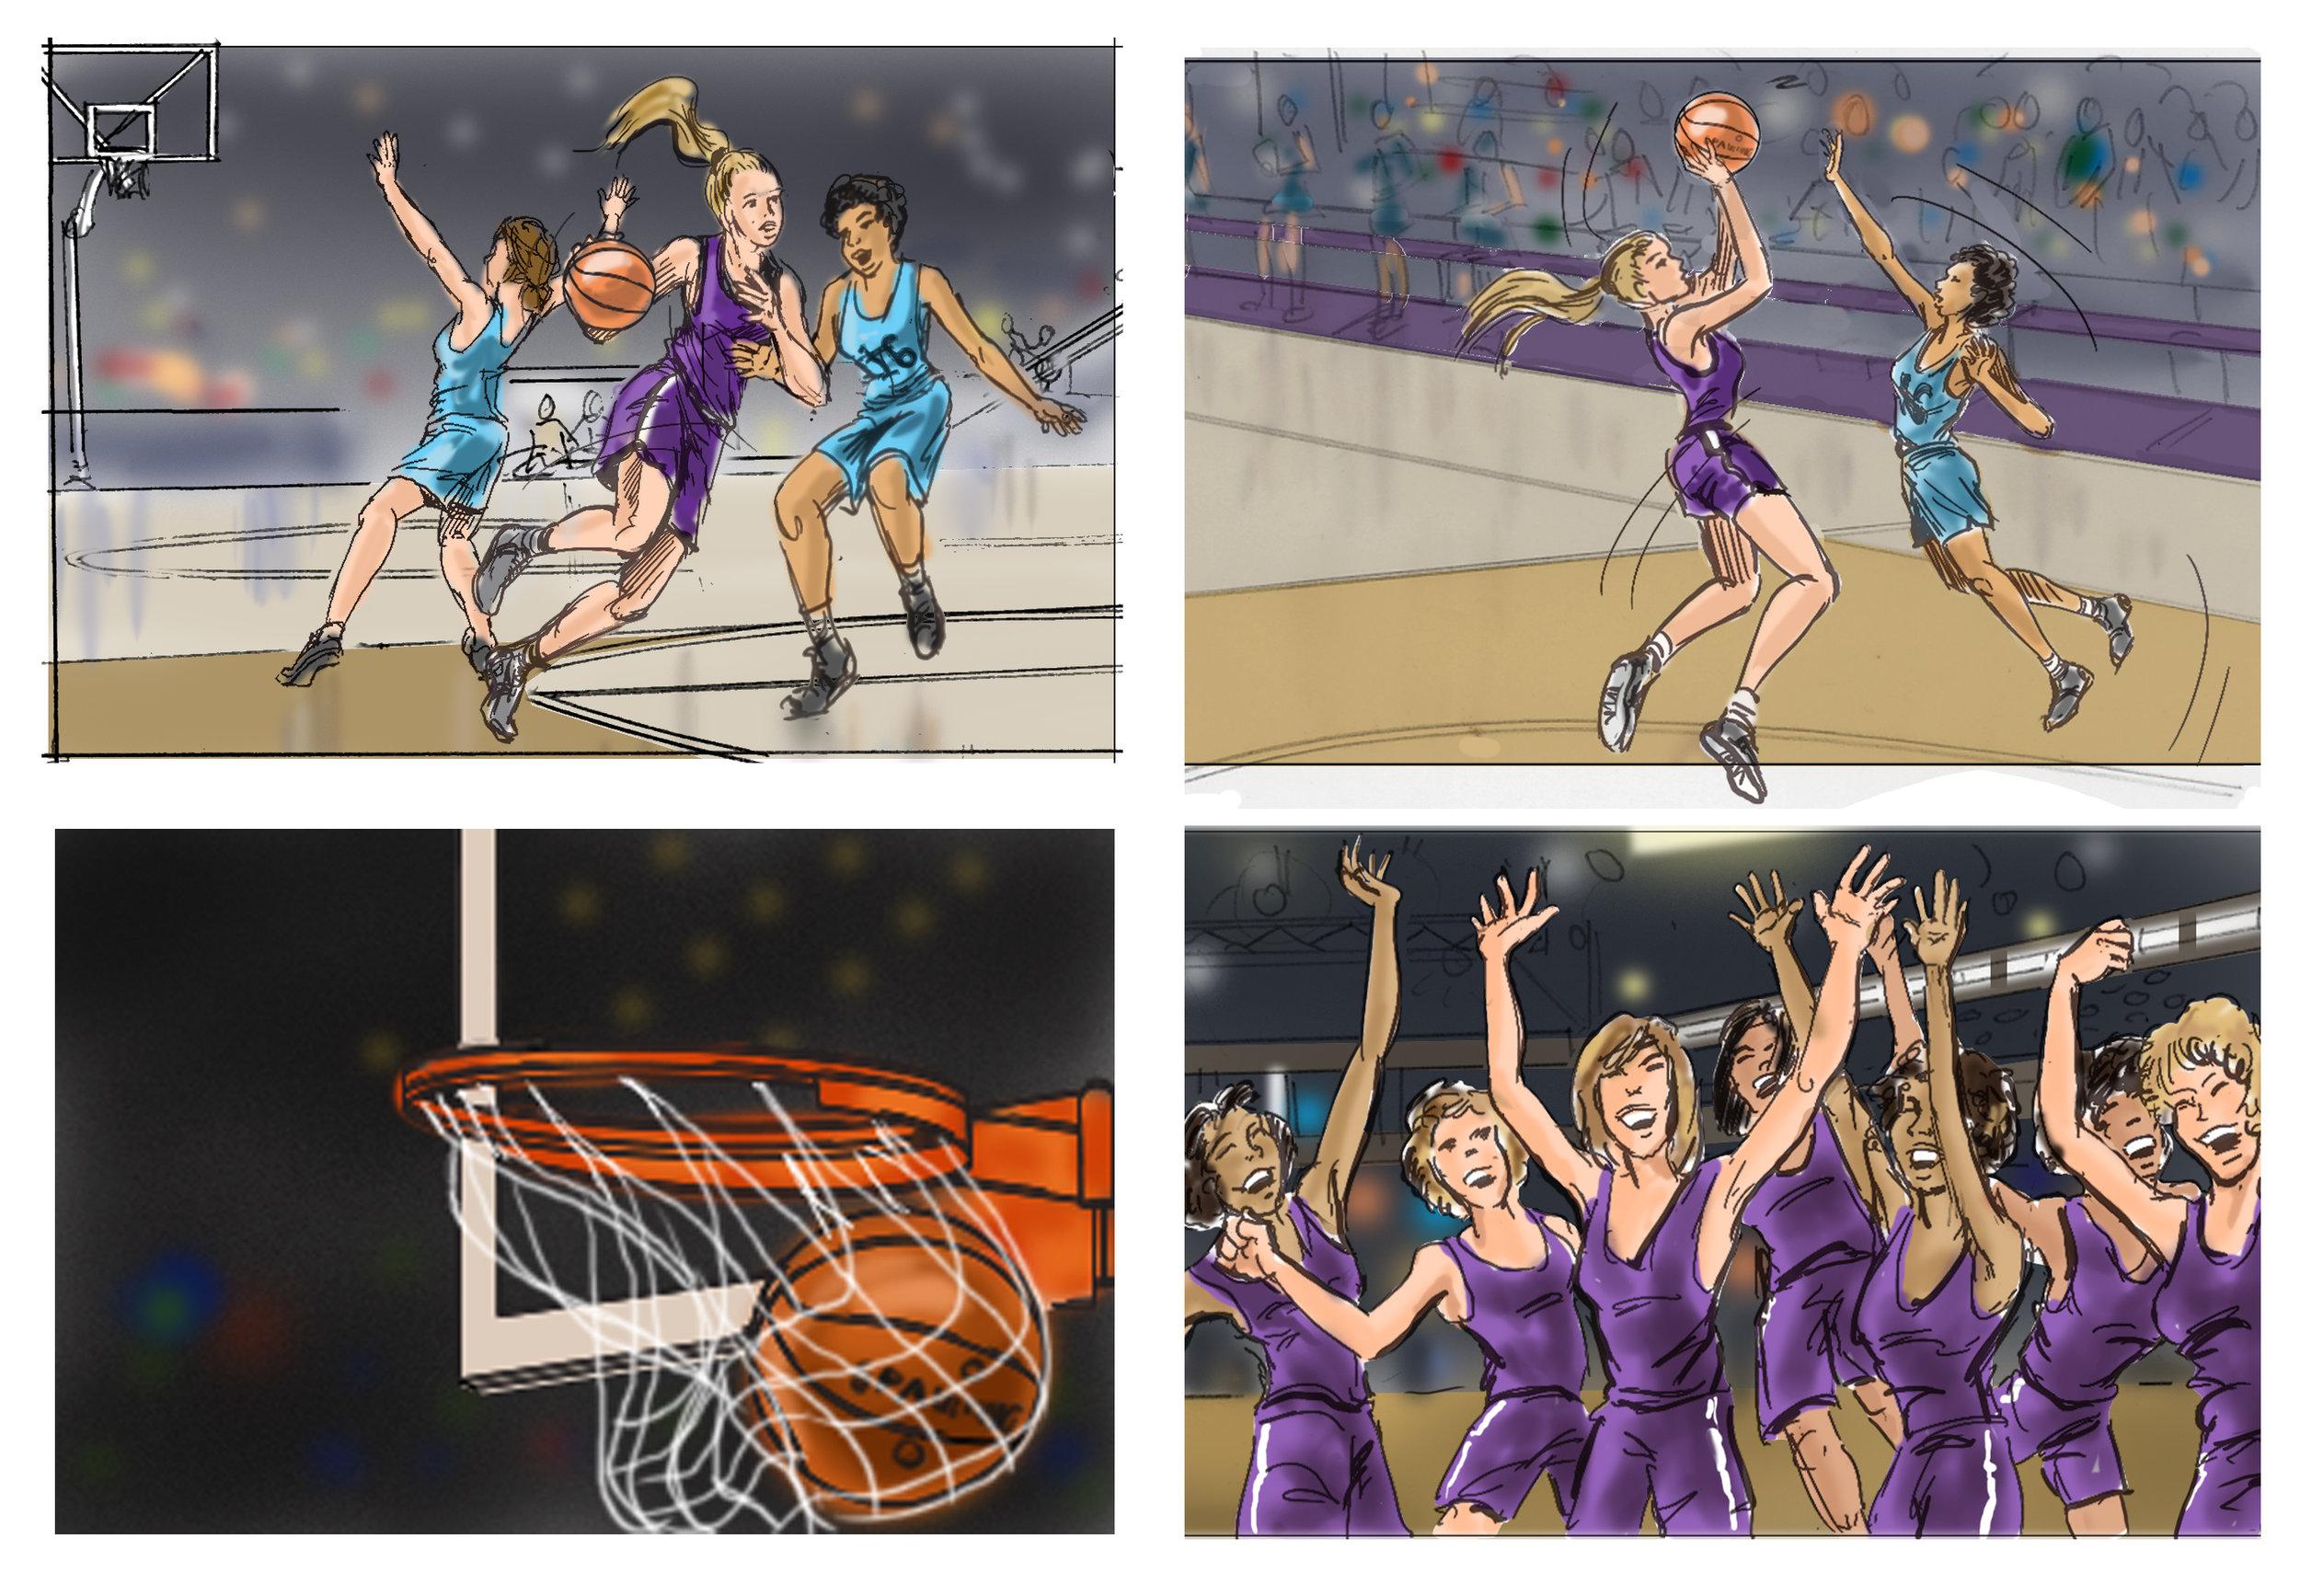 Basketball_Final_frames_1_4.jpg